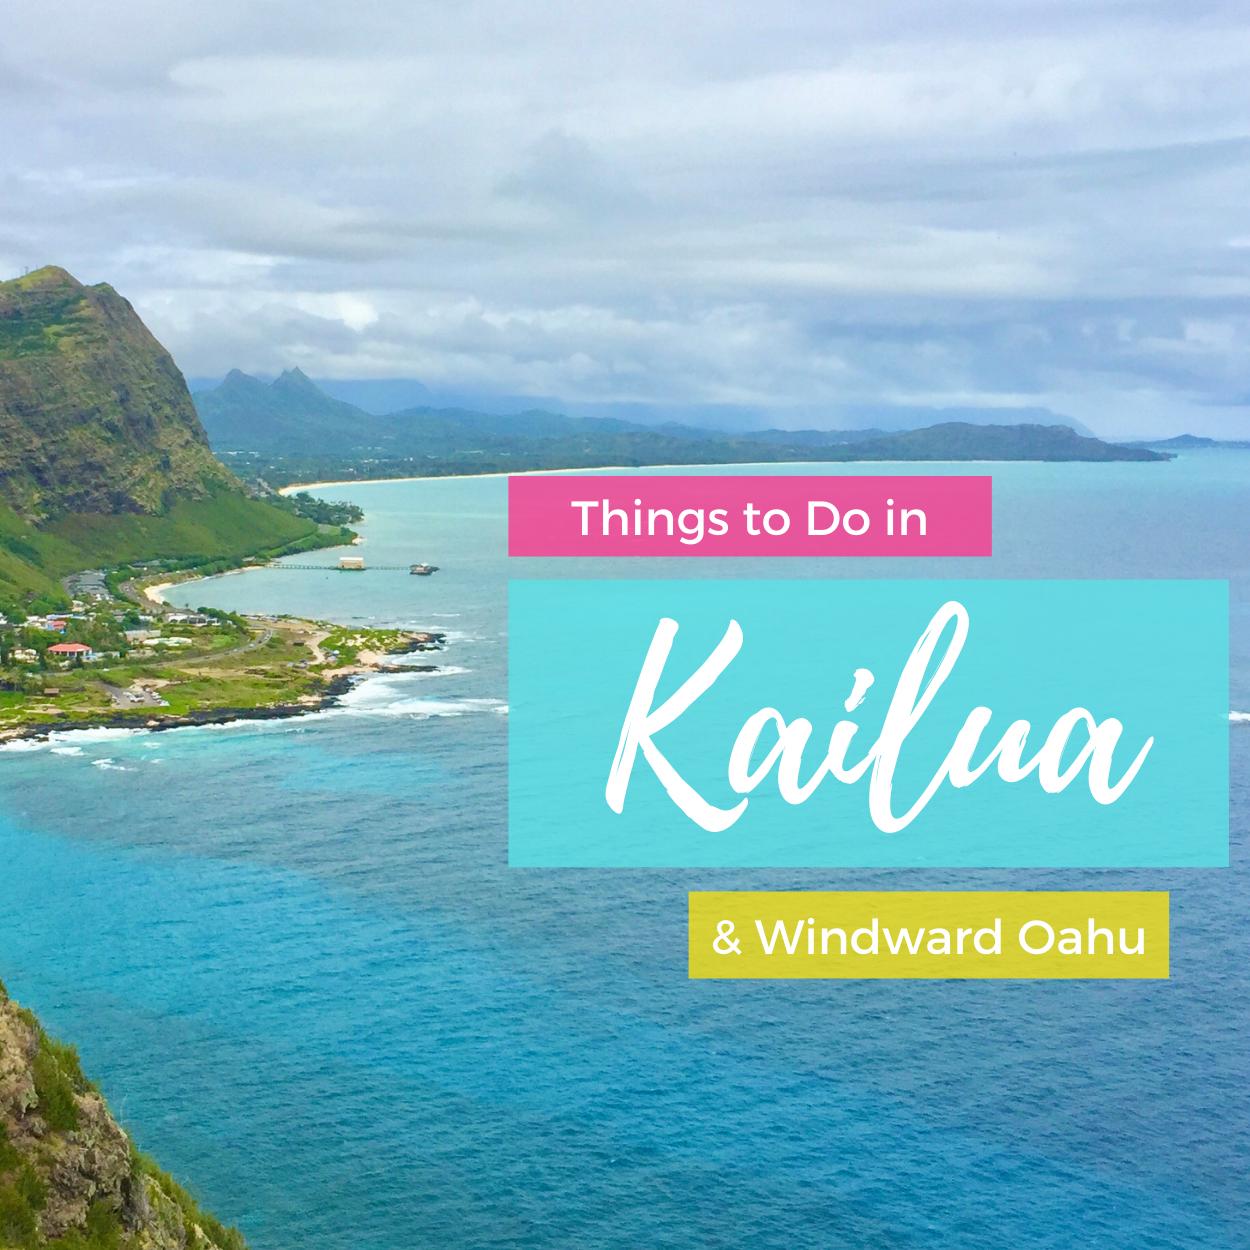 Things to Do in Kailua & Windward Oahu